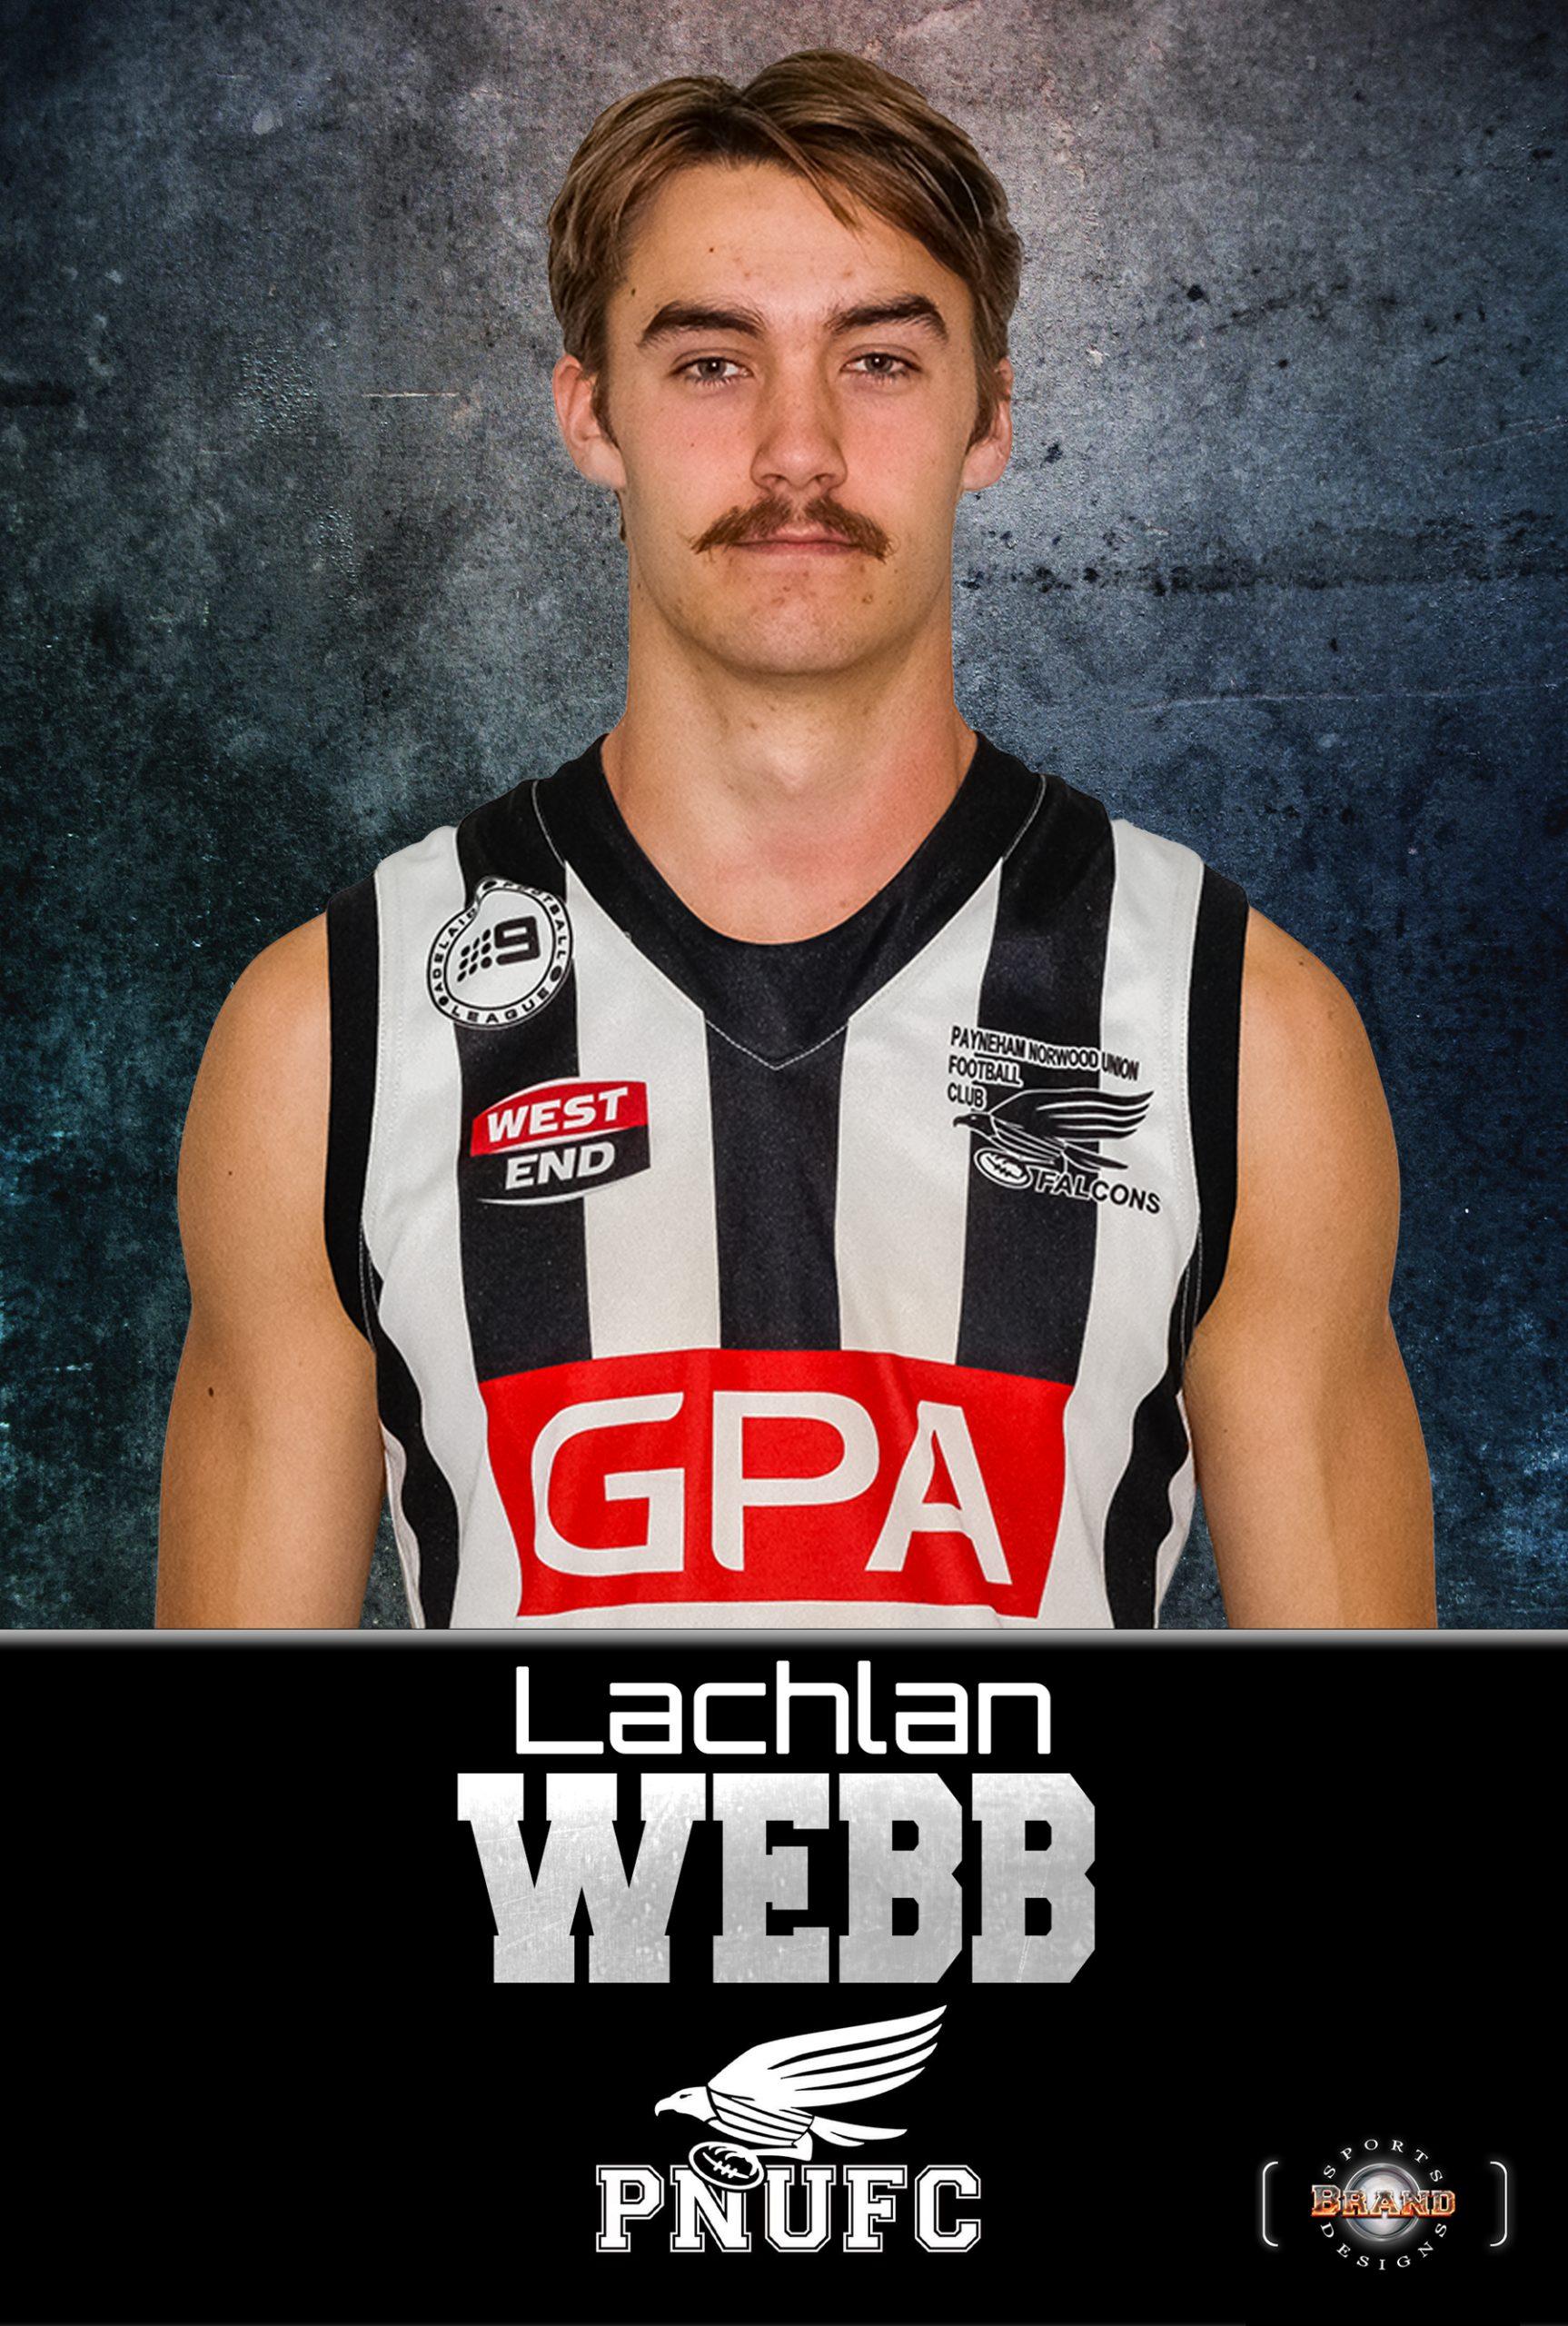 Lachlan Webb